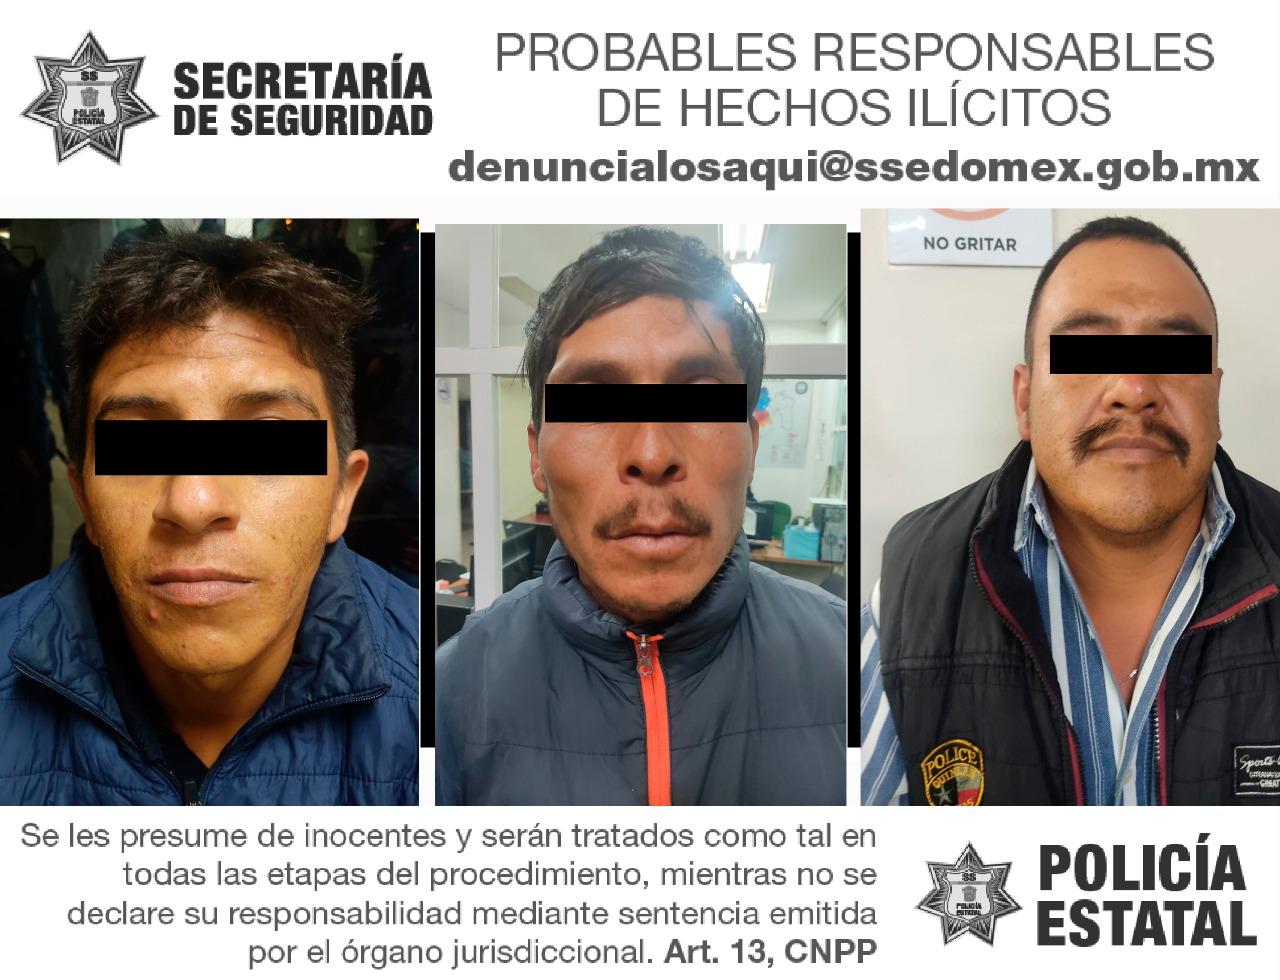 POLICÍAS LOCALIZAN VEHÍCULO CON REPORTE DE ROBO CON VIOLENCIA